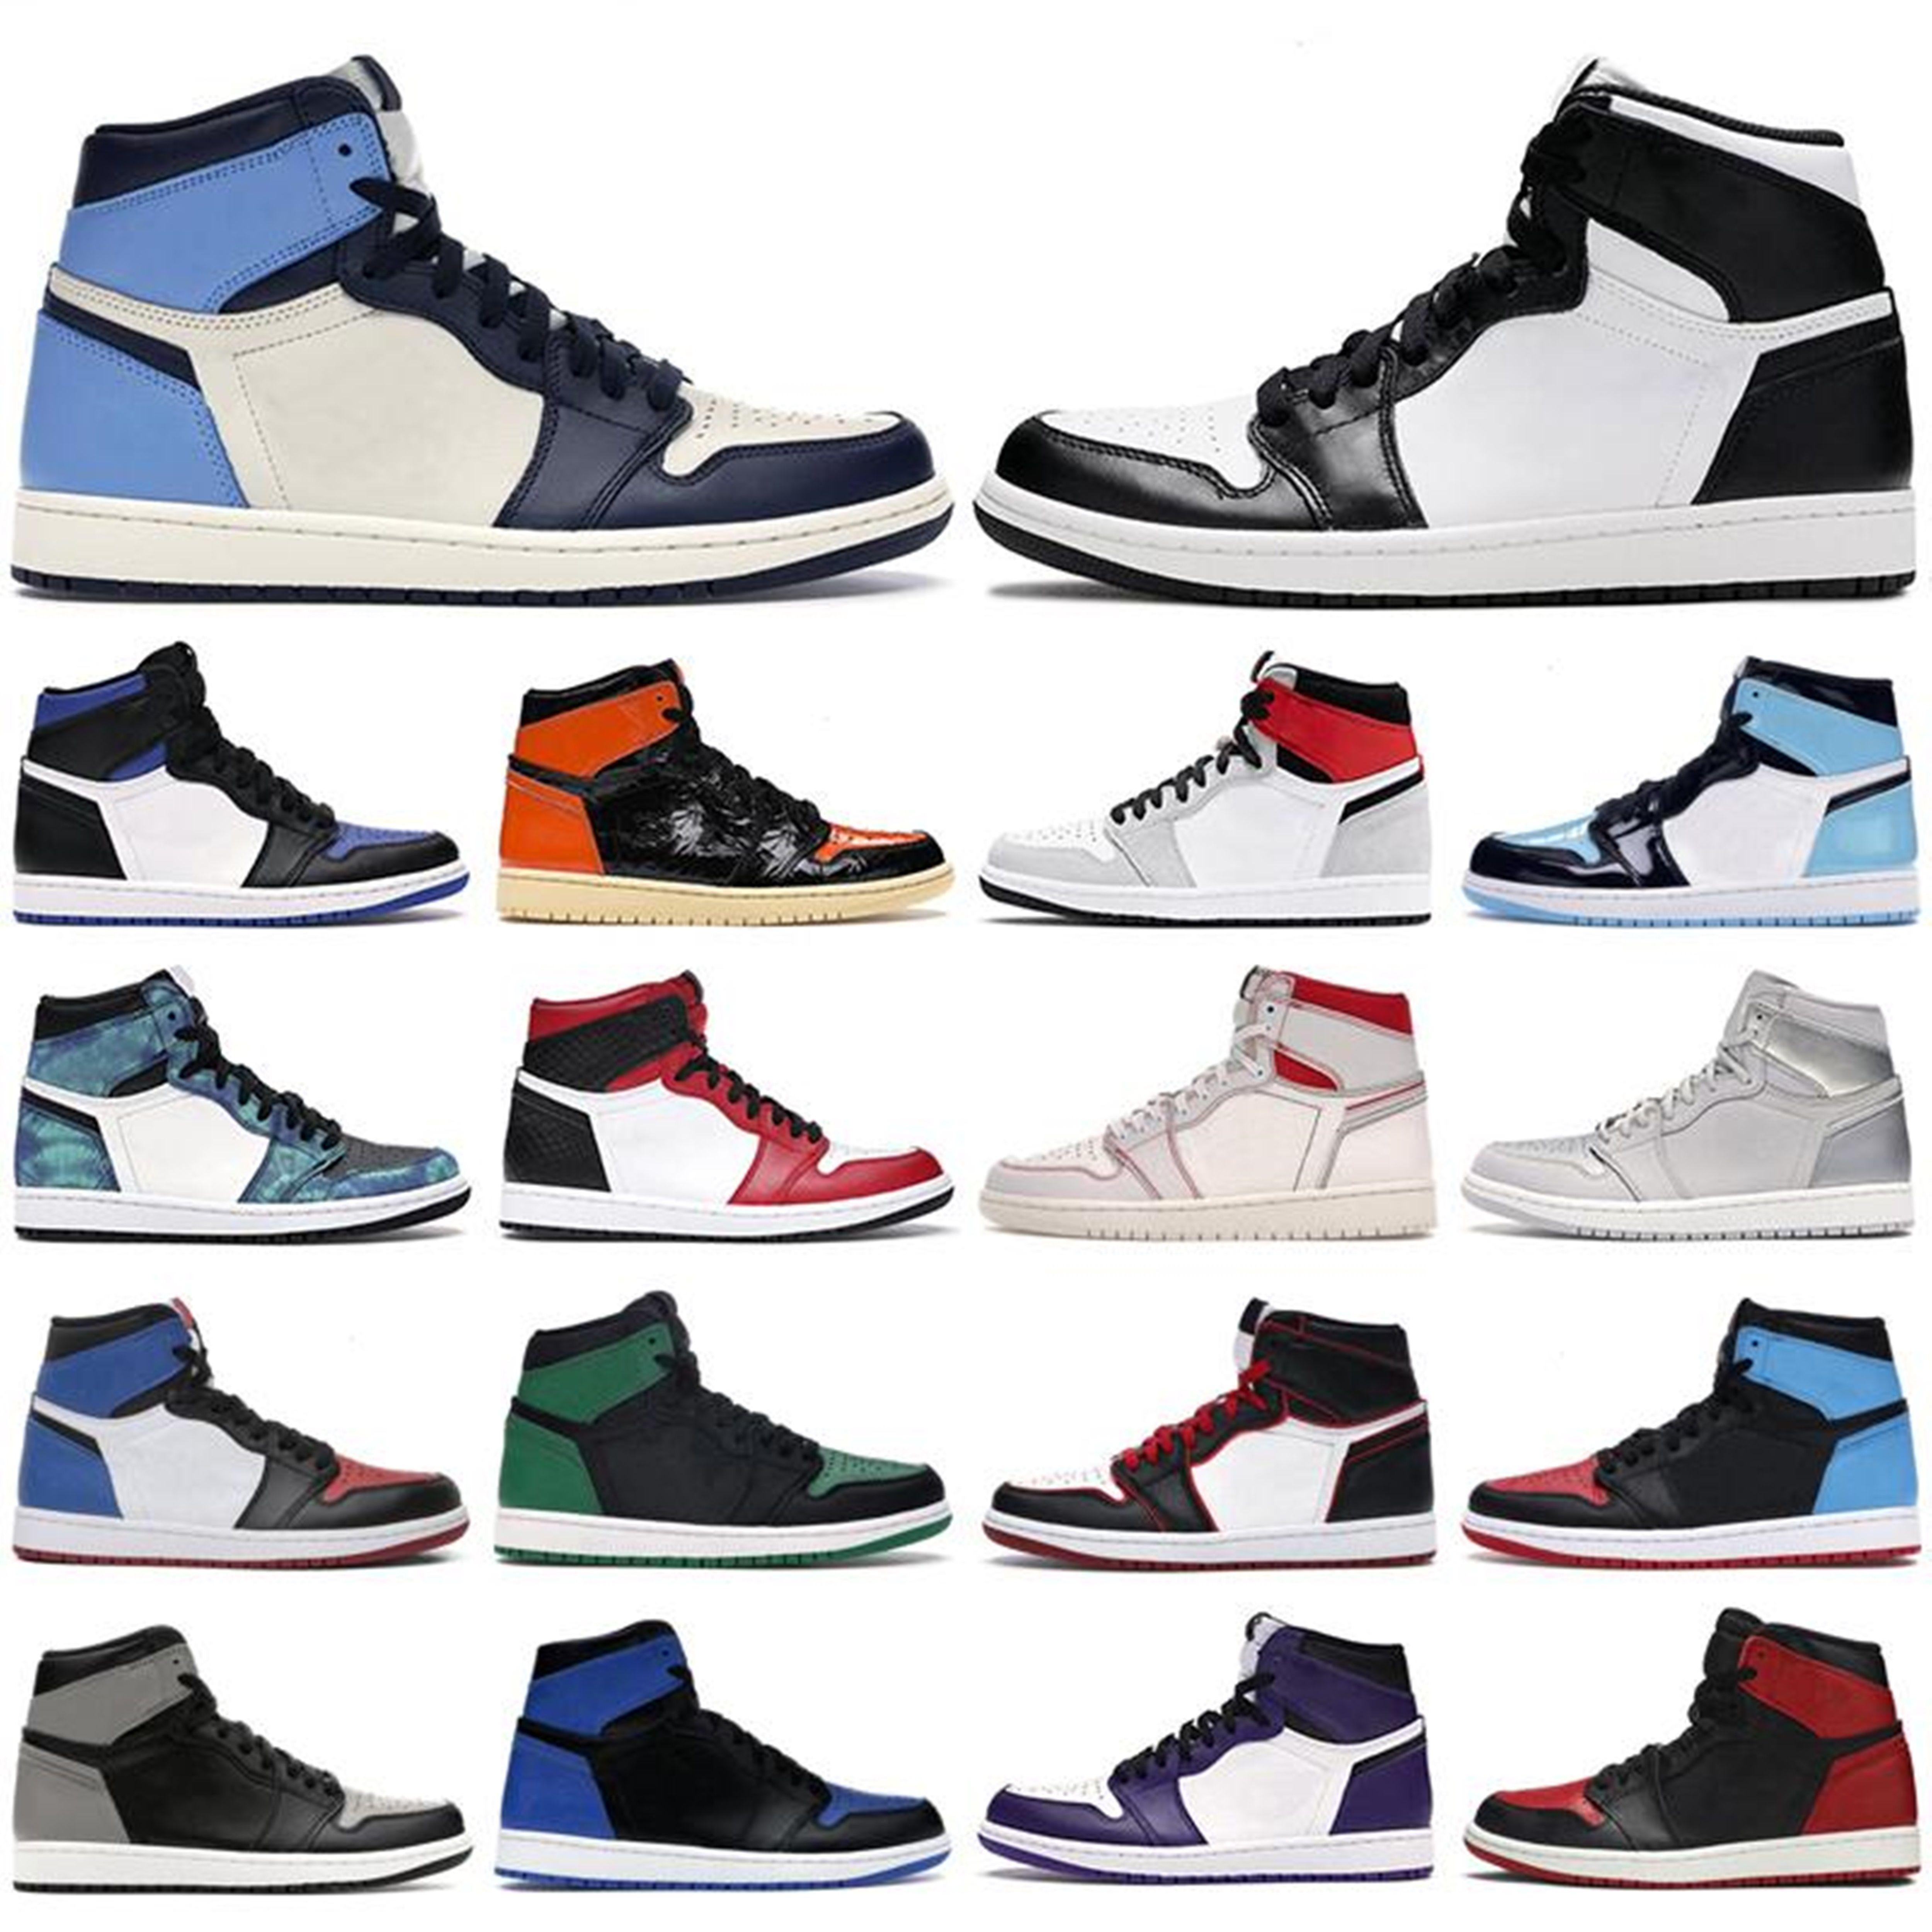 Novo Jumpman Alto 1 1s OG Basquetebol Shoes Mid Chicago Royal Toe Pine Gold Pine Green Green Black Unc Patent Homens Mulheres Sports Sneakers